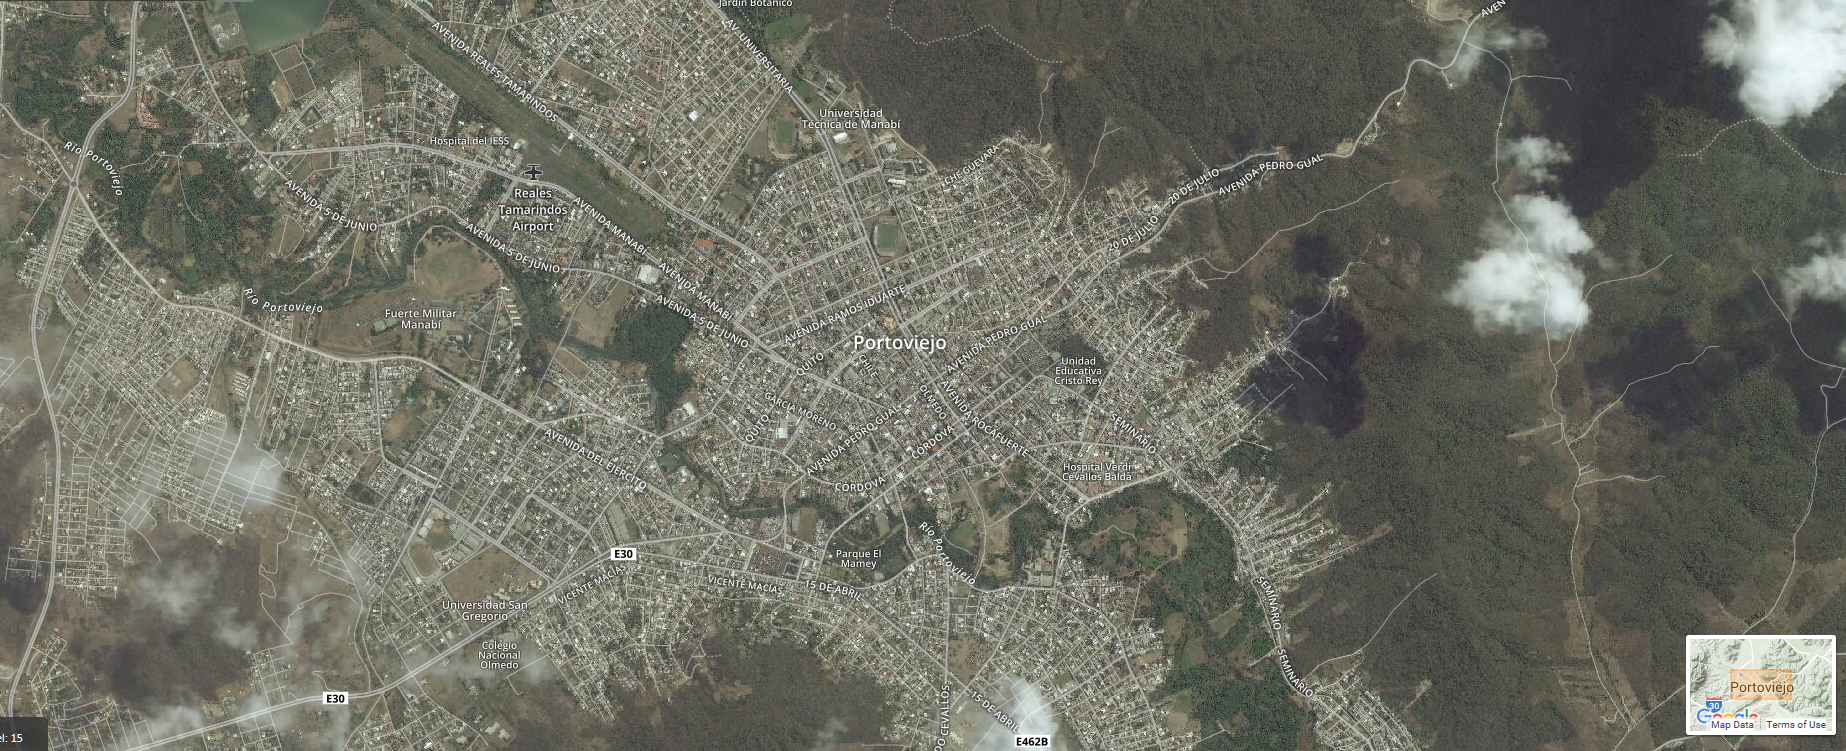 Portoviejo, Ecuador before the earthquake.